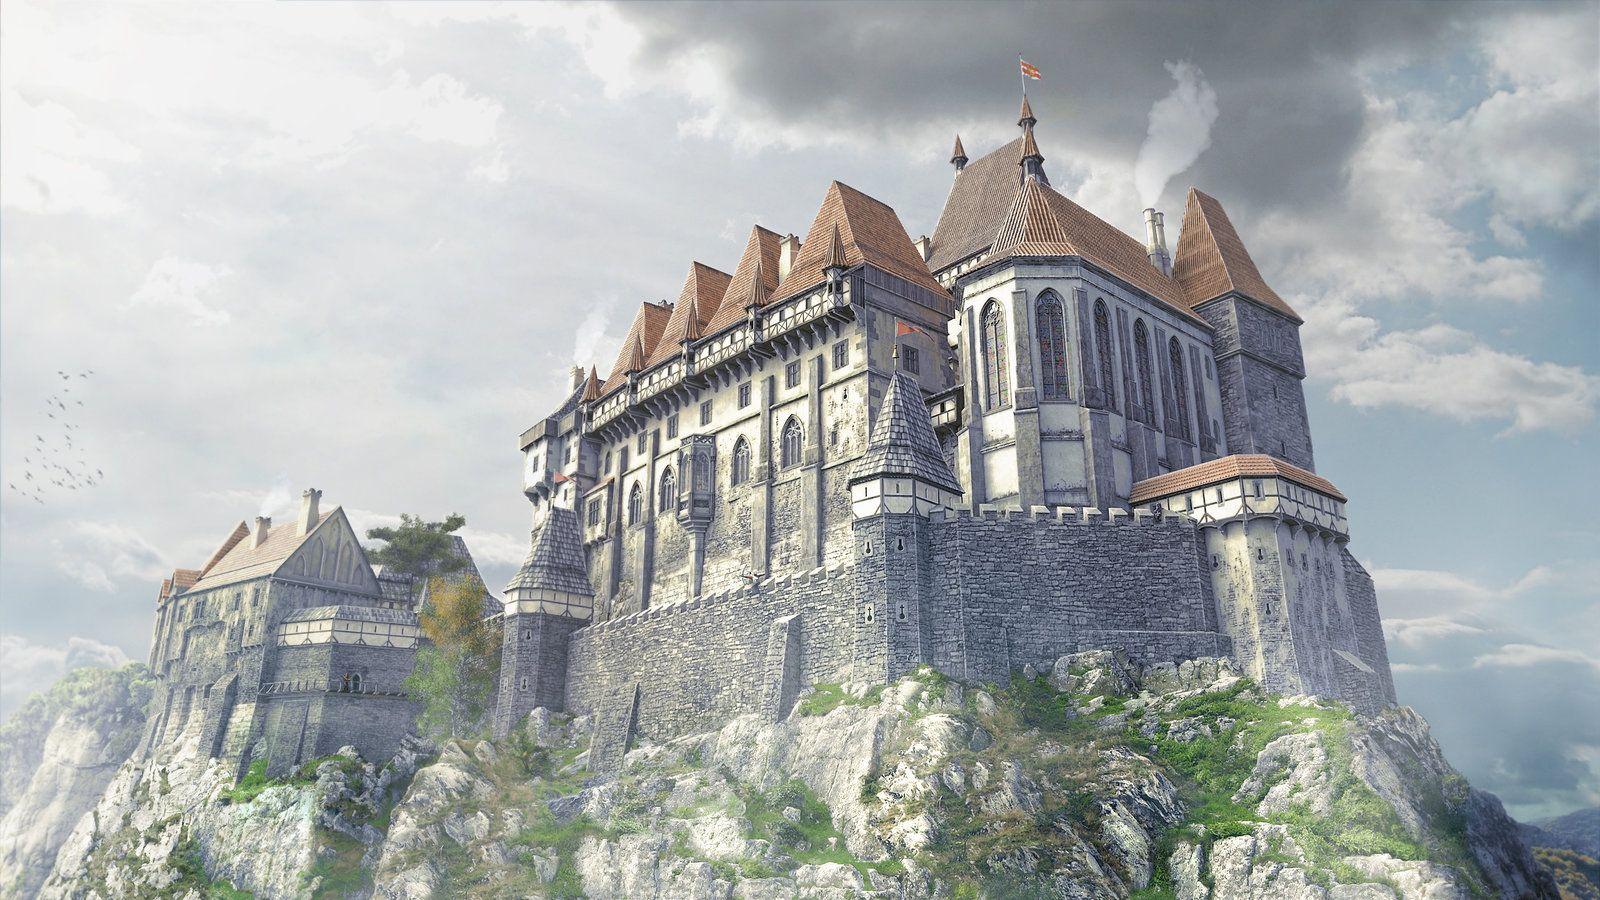 3d castle royal palace by montezuma on deviantart 3d art pinterest. Black Bedroom Furniture Sets. Home Design Ideas